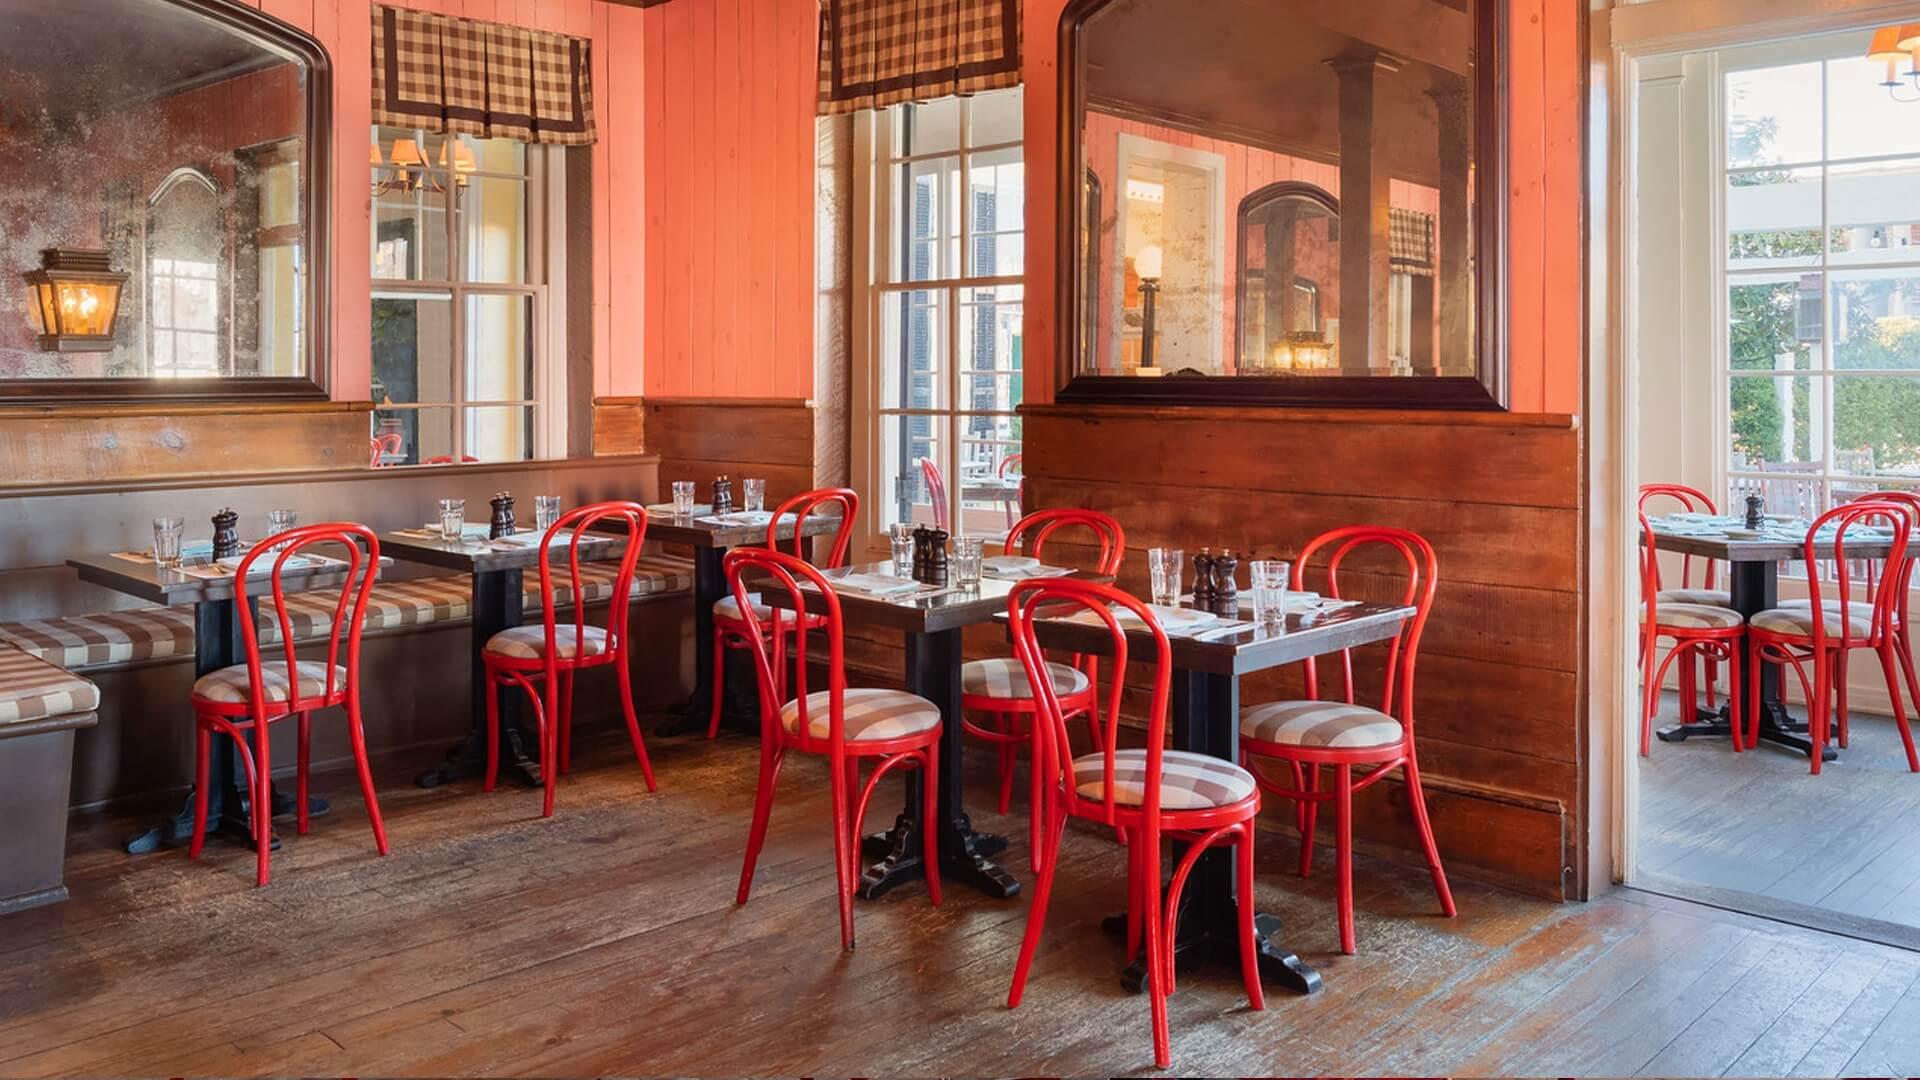 Blue Pig Tavern Cape May Nj Restaurant At Congress Hall